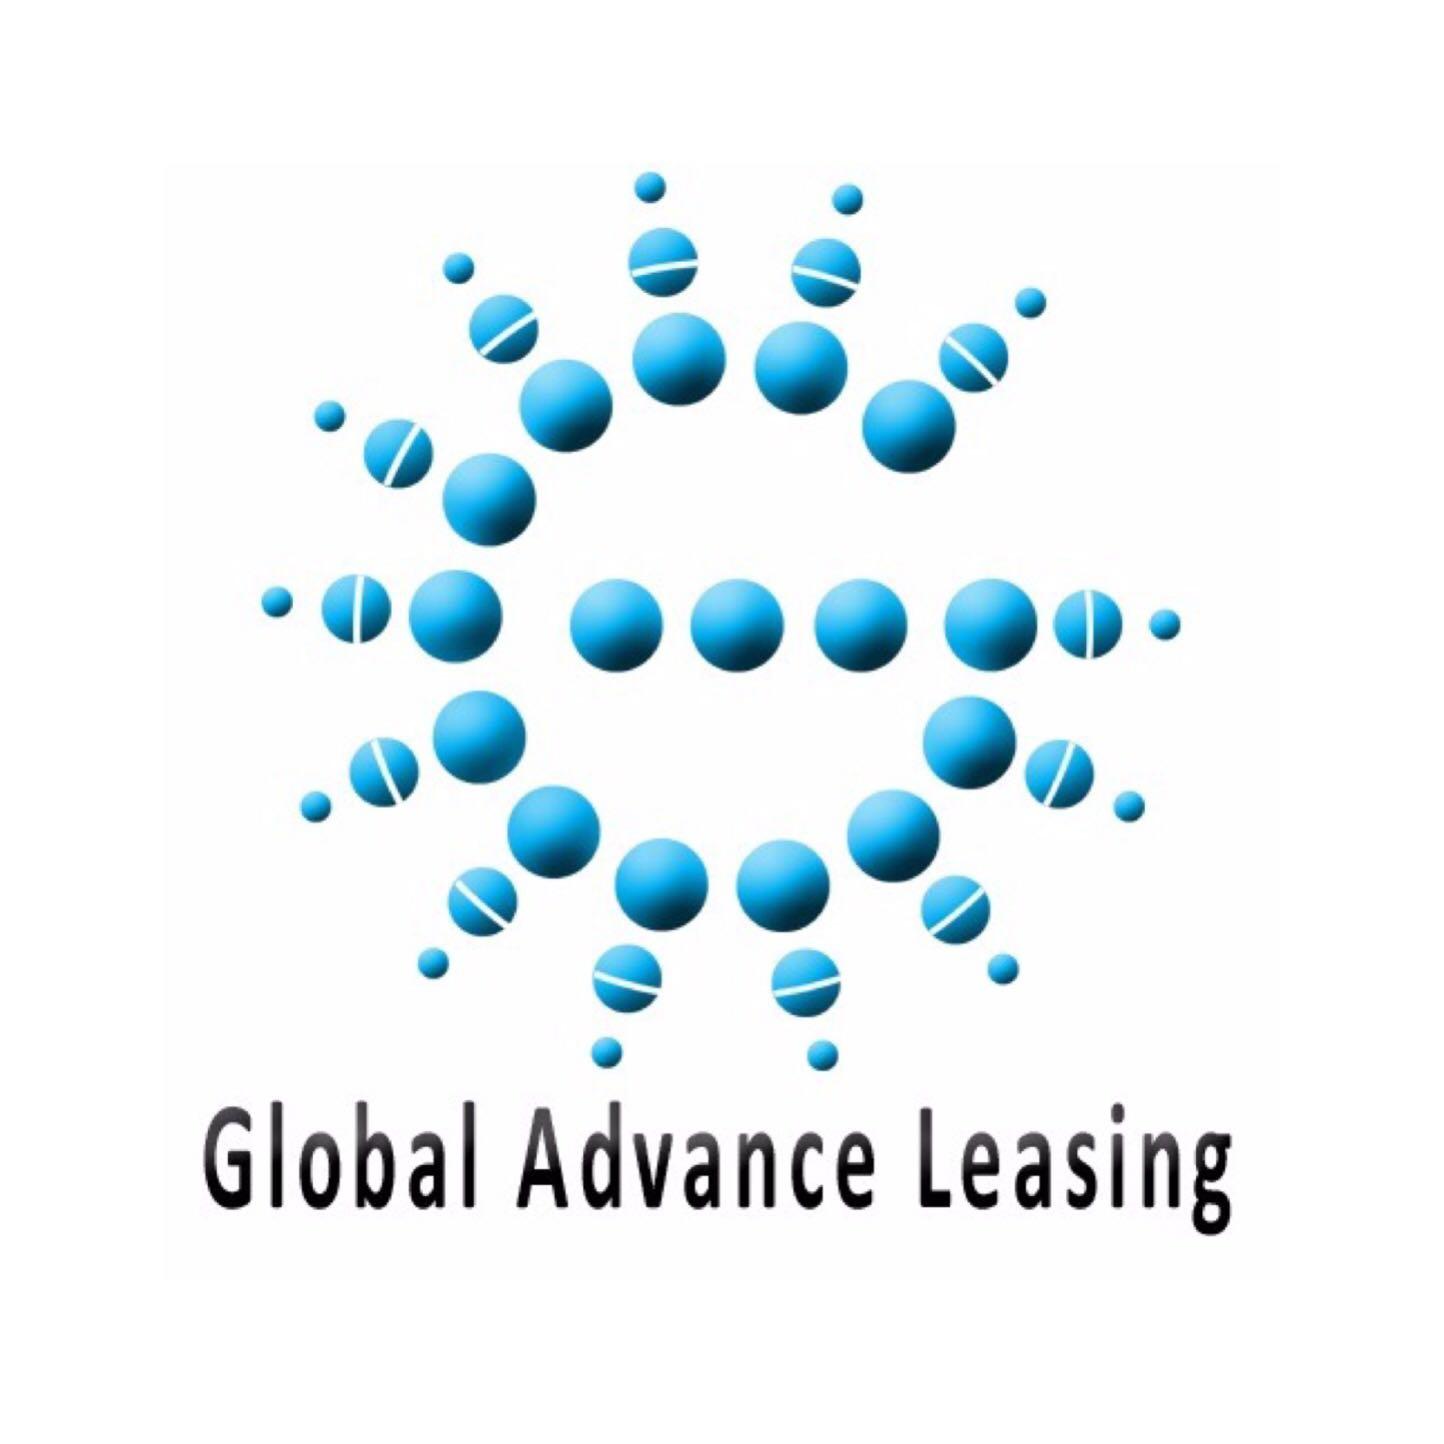 globaladvanceleasing